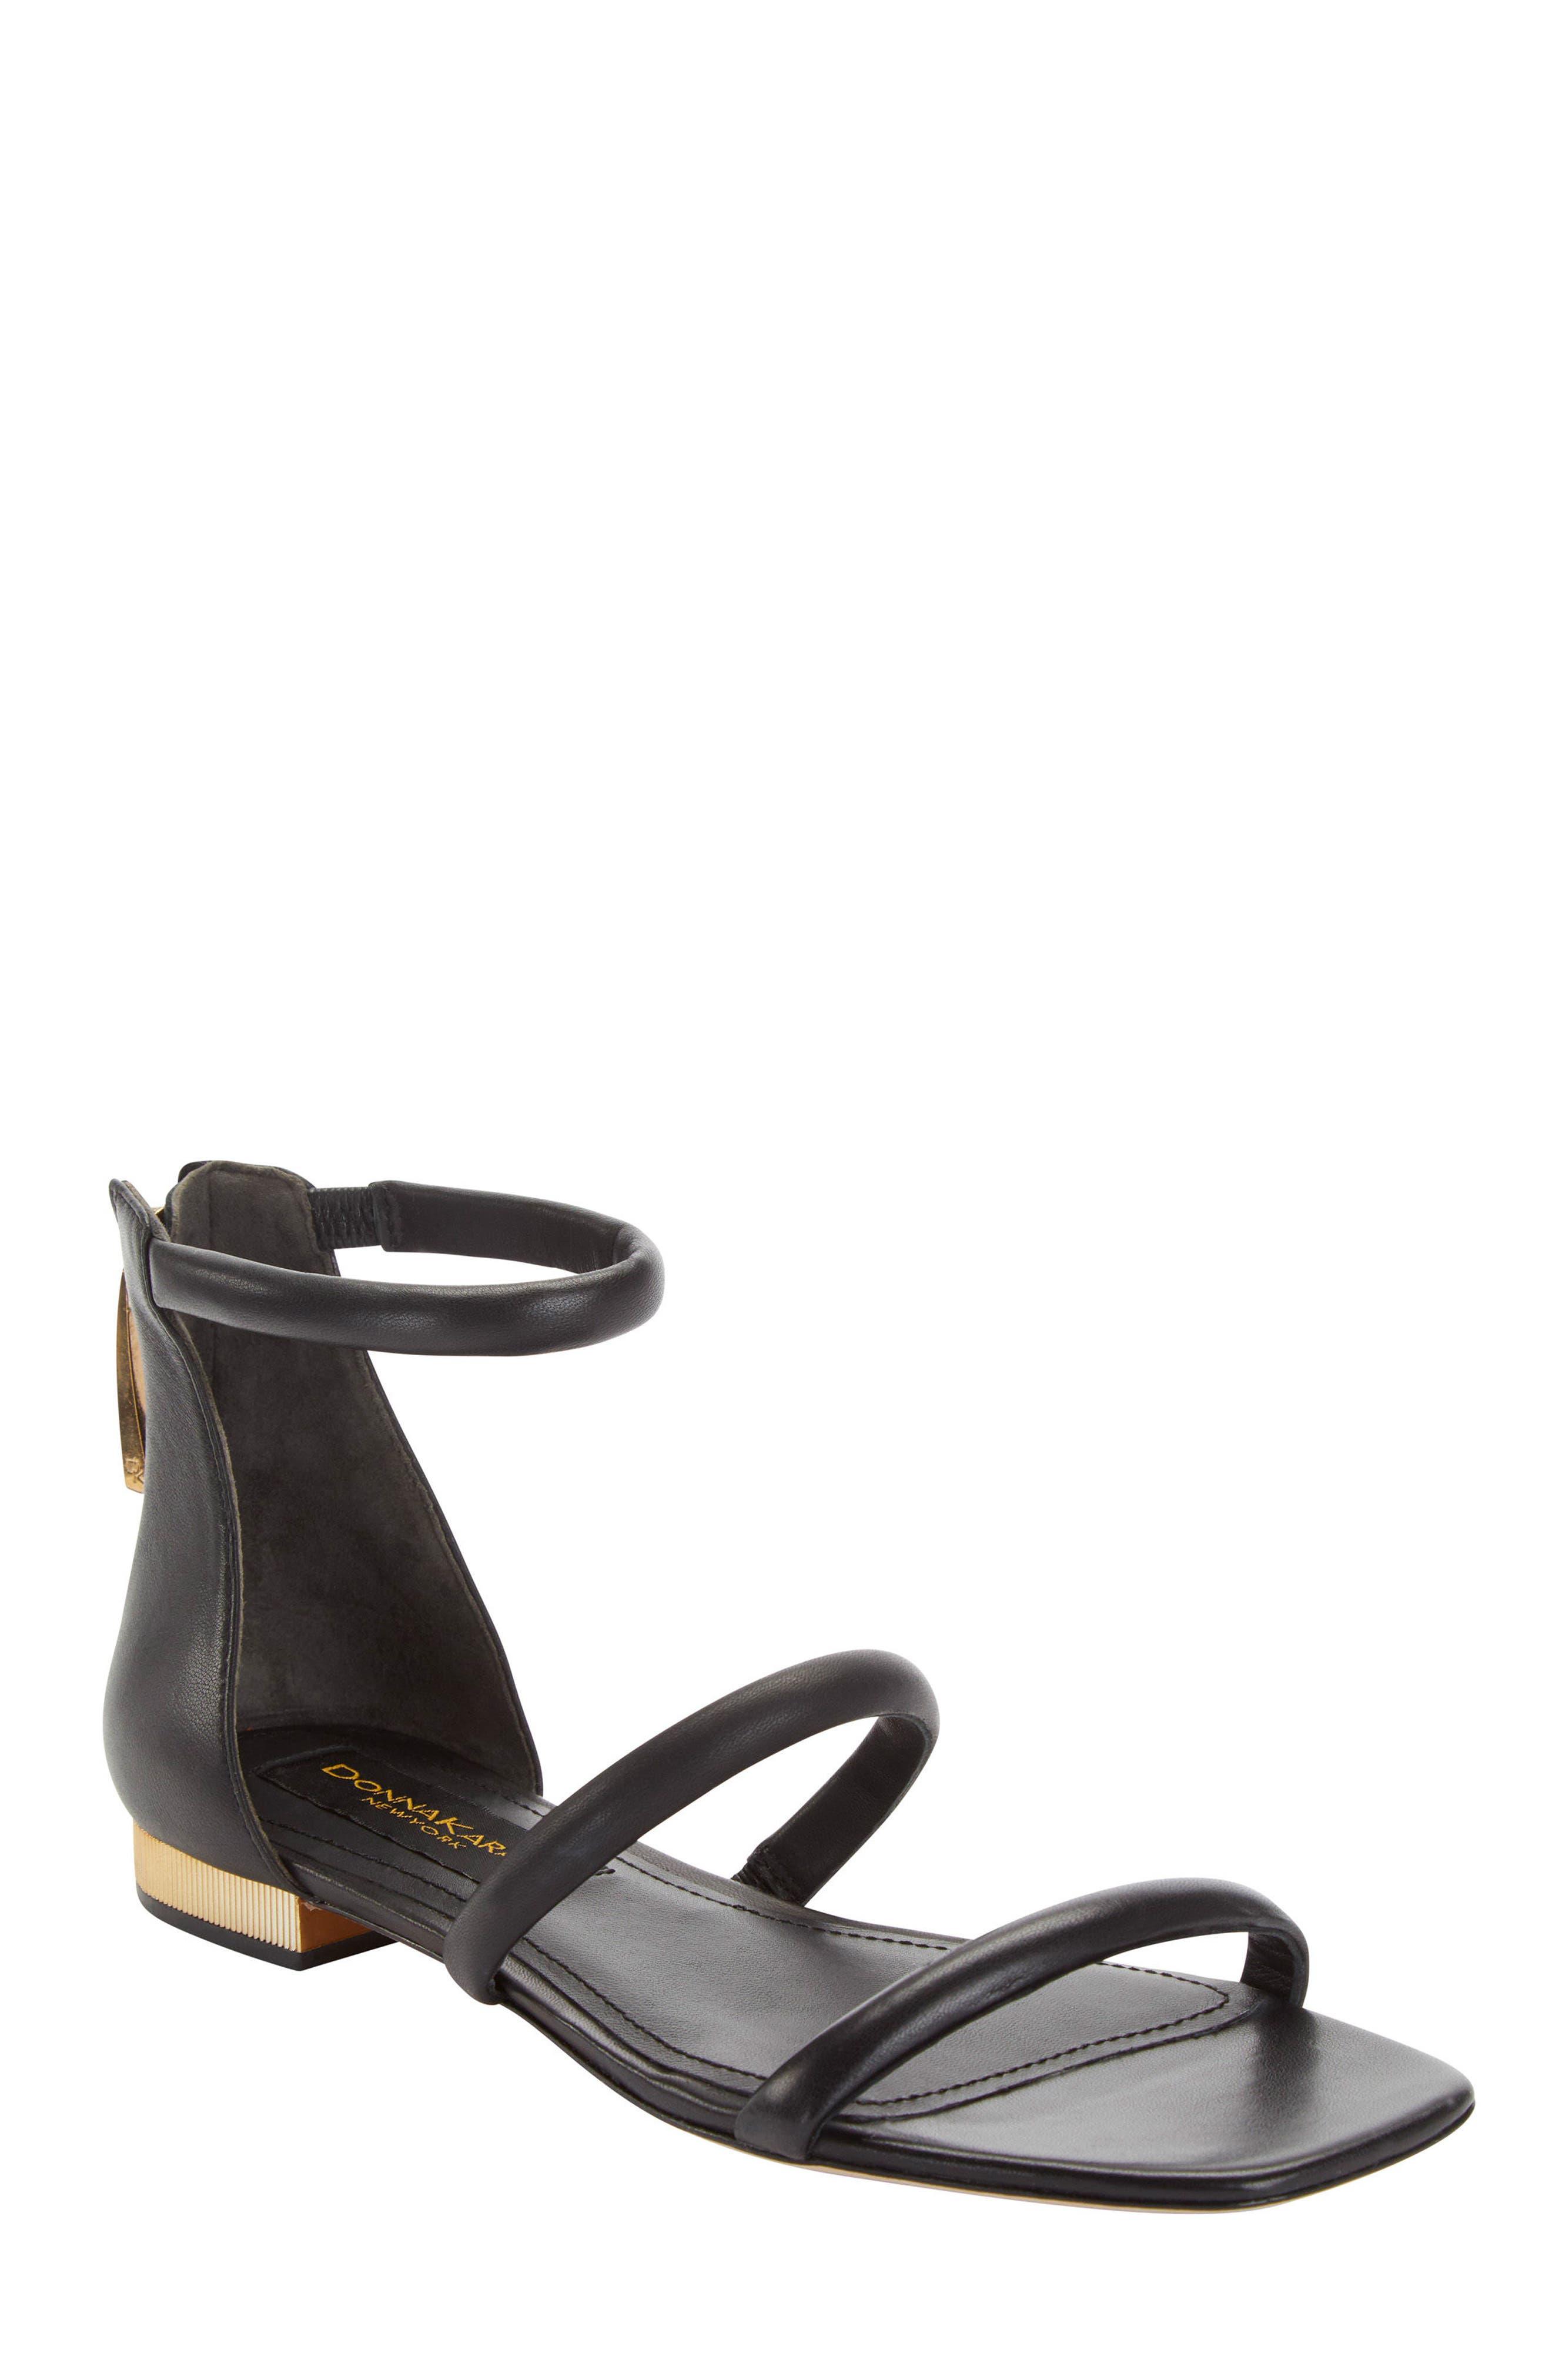 Donna Karan Galina Sandal,                             Main thumbnail 1, color,                             Black Leather